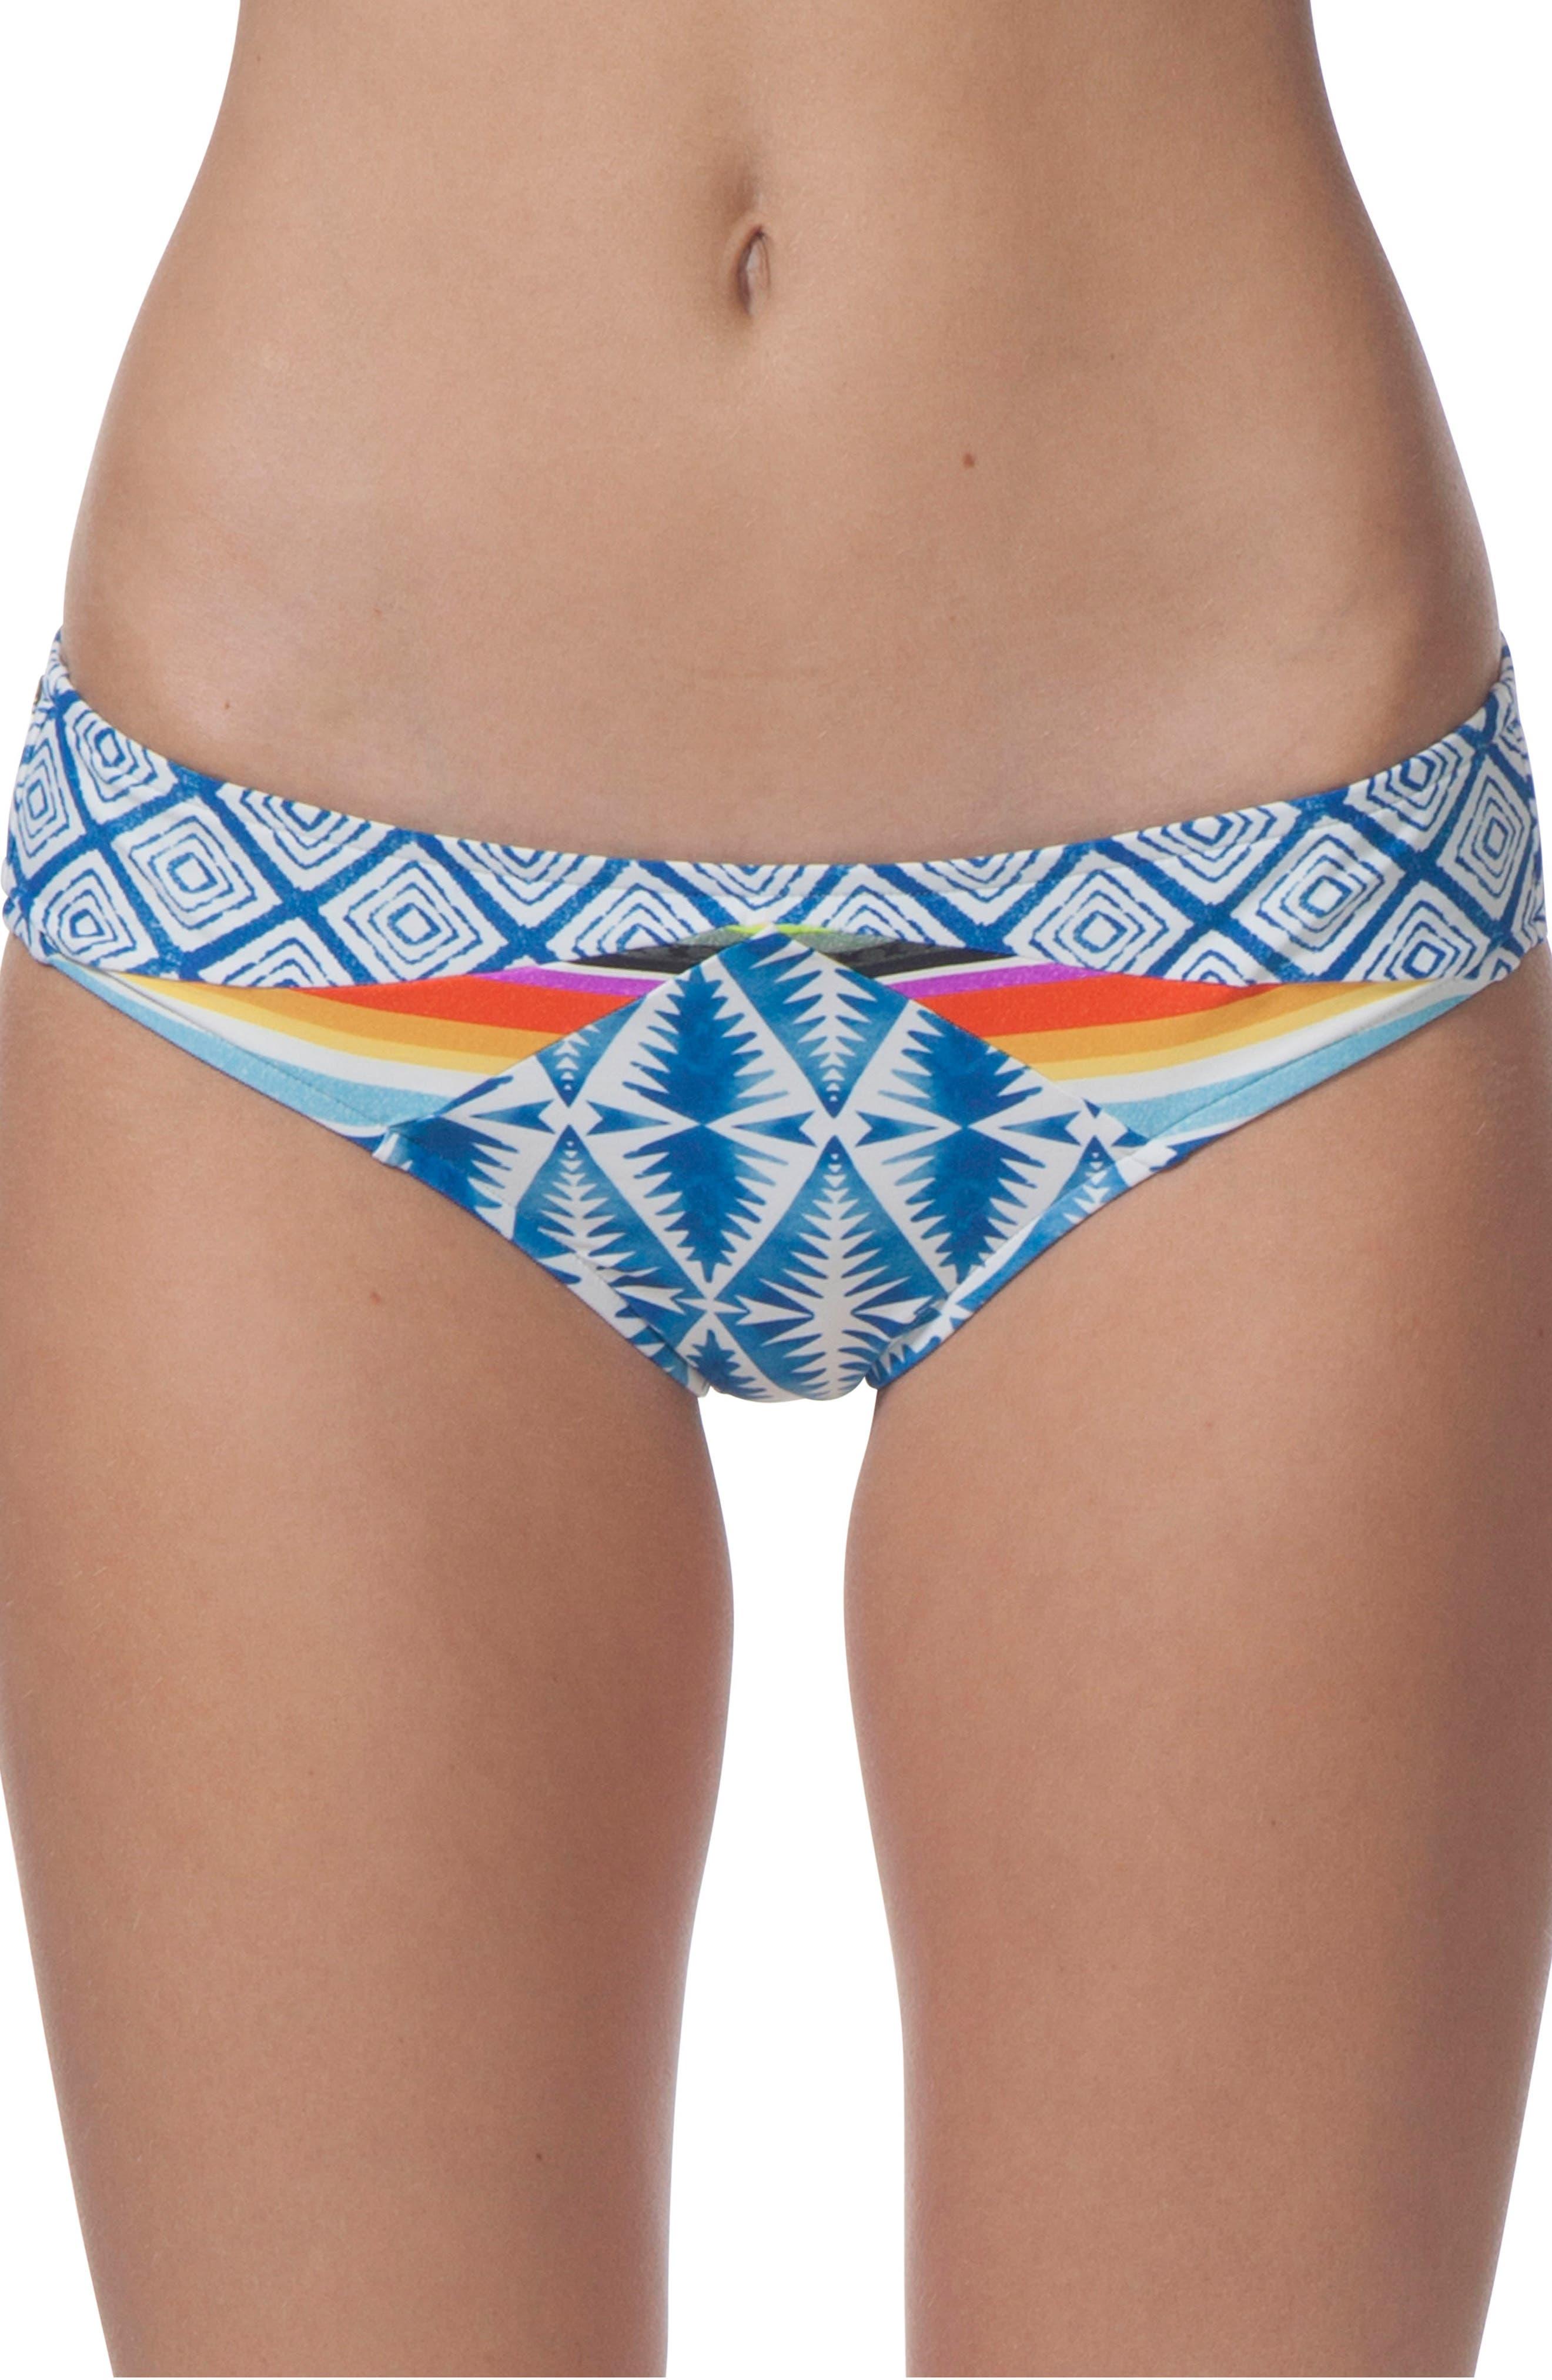 Beach Bazaar Hipster Bikini Bottoms,                             Main thumbnail 1, color,                             400